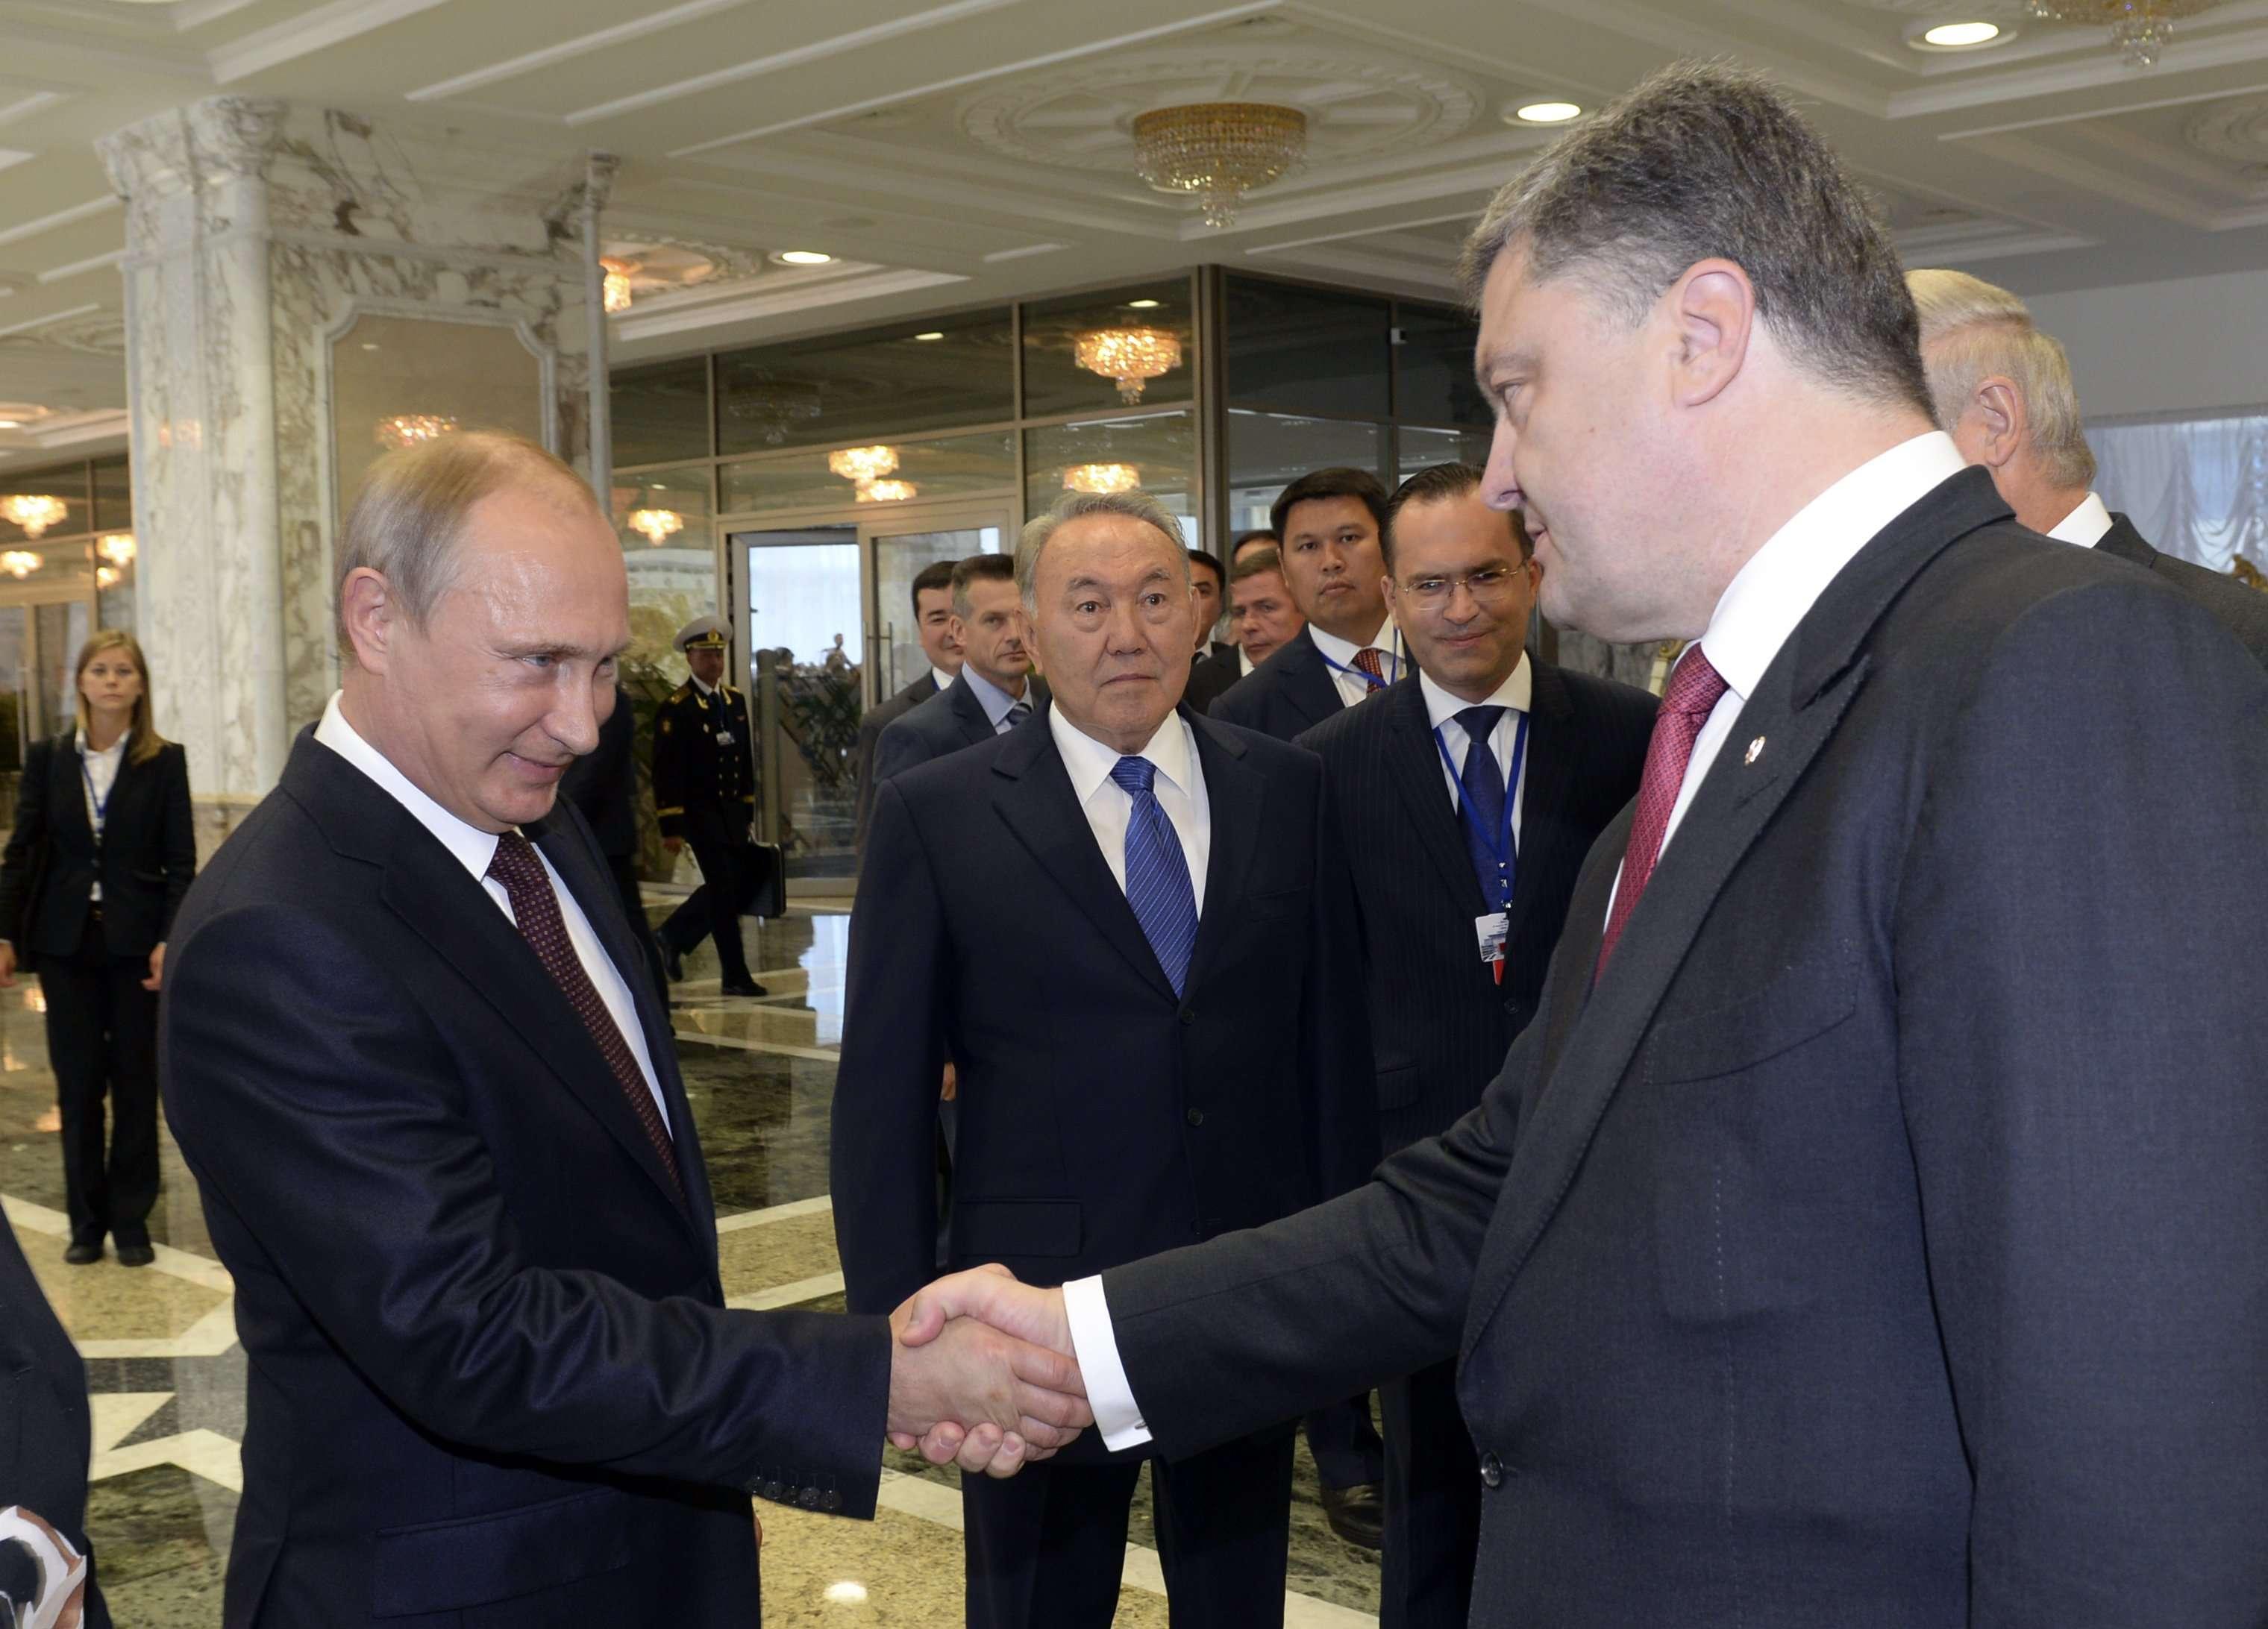 Sergei Bondarenko/Kazakh Presidential Office